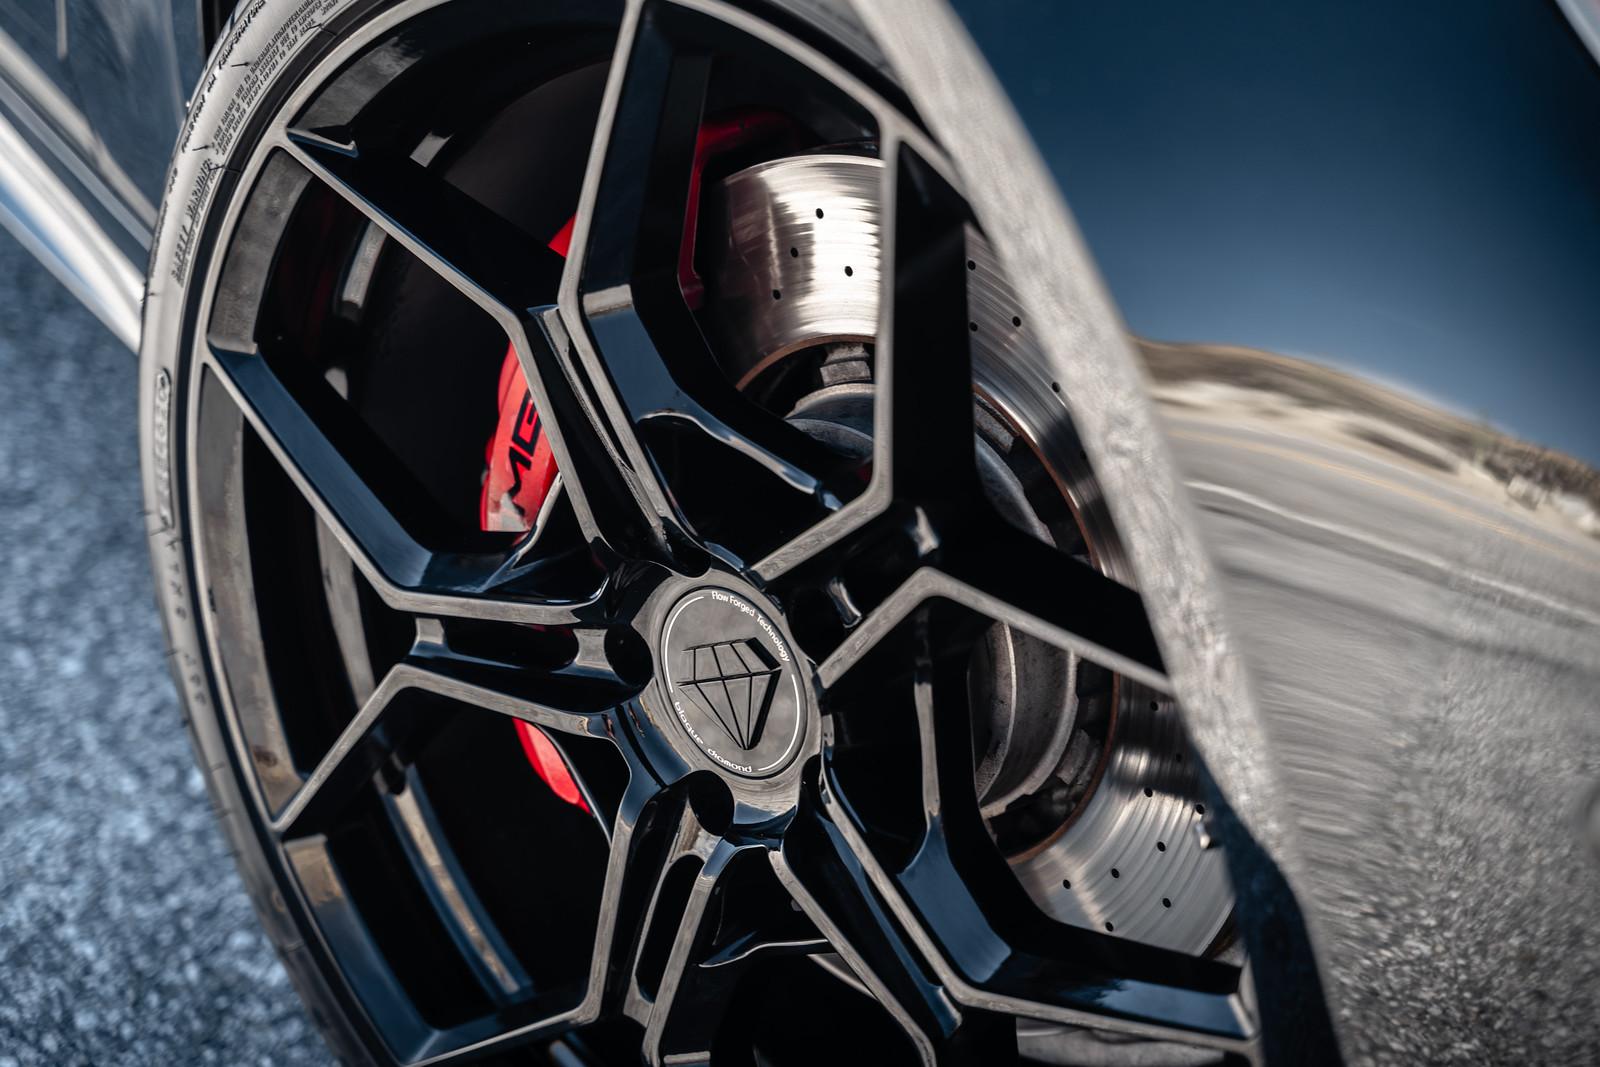 2016_Mercedes_Benz_E63_S_AMG_BDF25_Gloss_Black_8